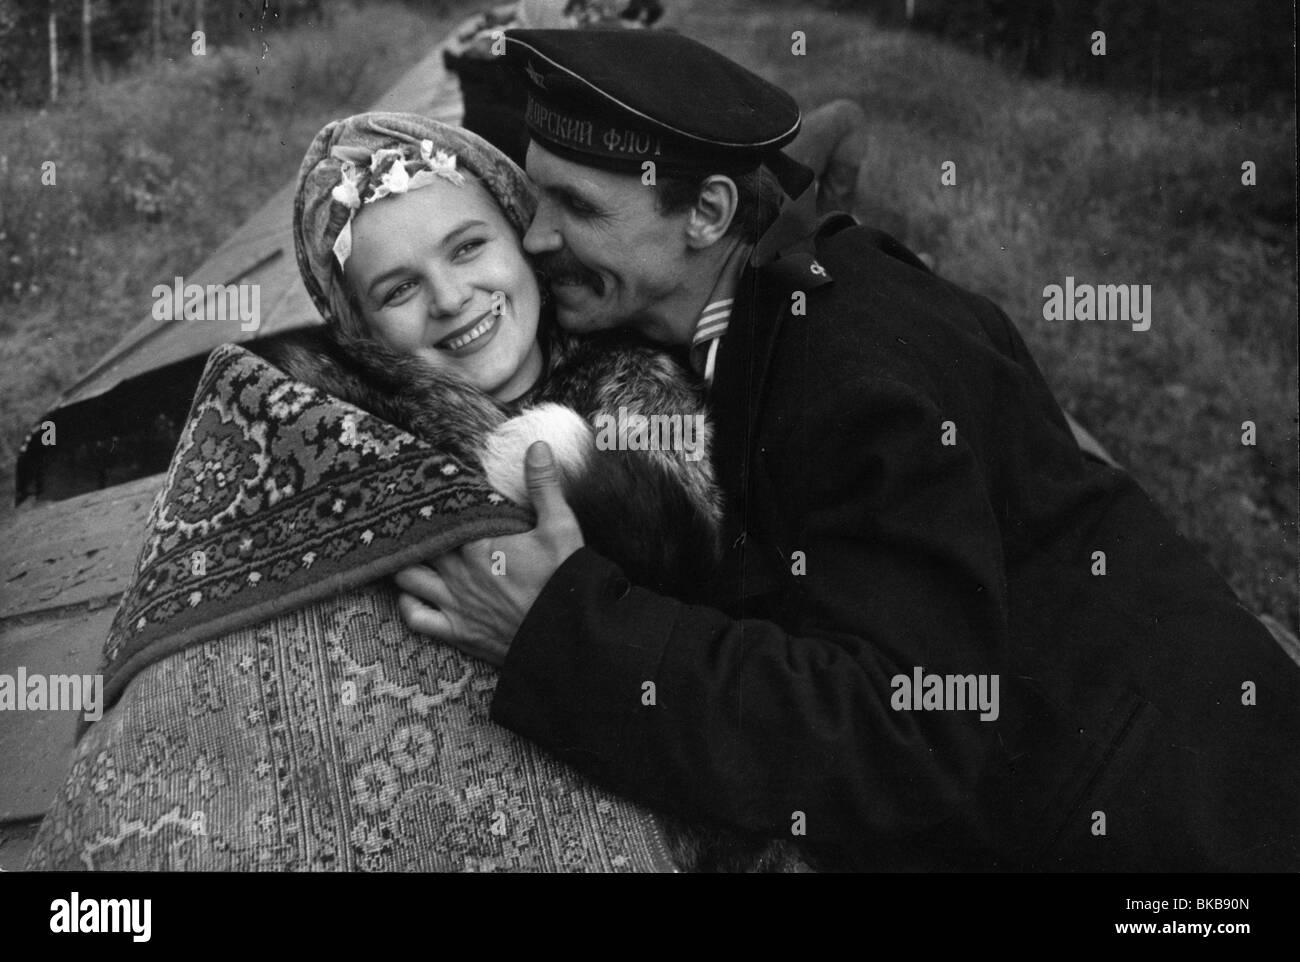 Triste Detskiy Año : 1983 Director : Jevgeni Yevtushenko Imagen De Stock